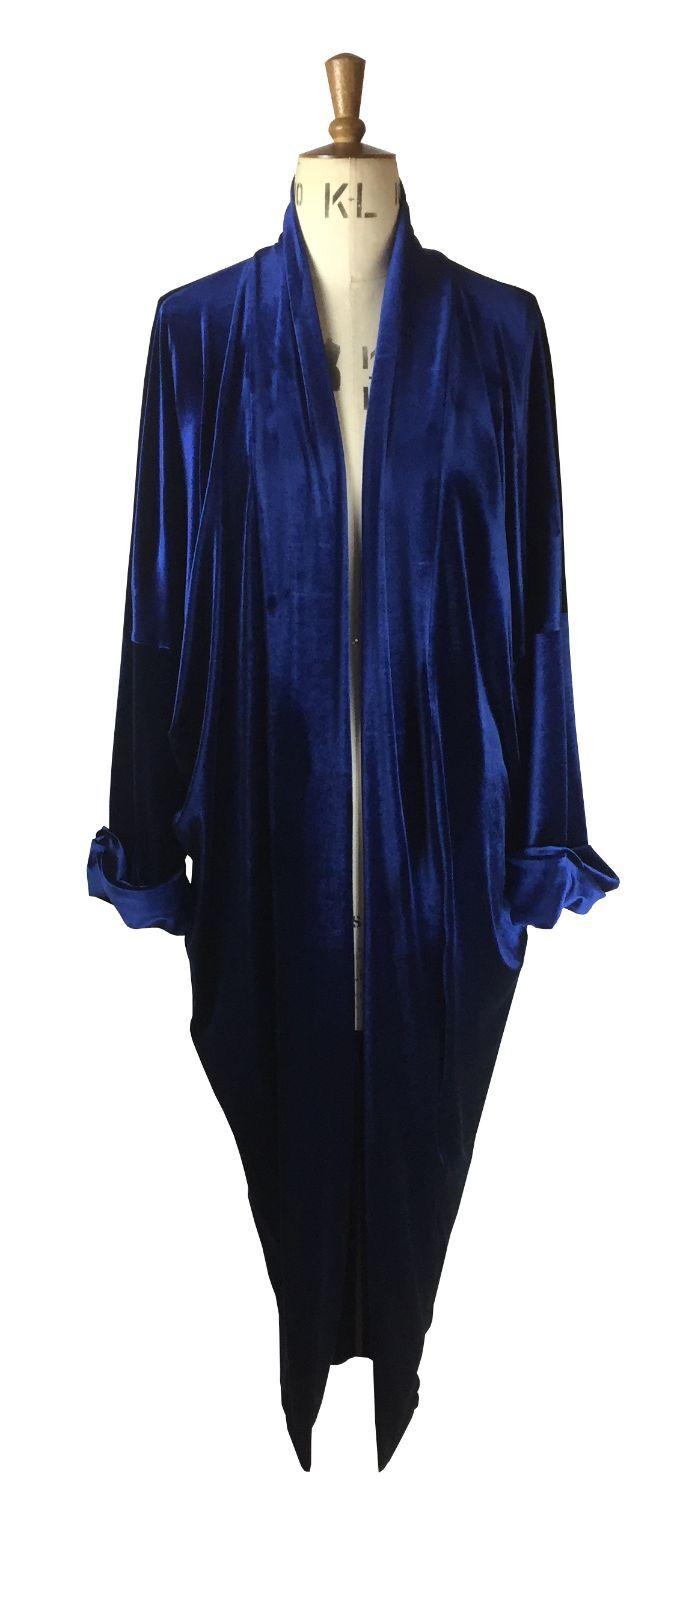 Baylis Knight Blau Velvet Duster Coat OverGröße Boho Retro Festival opera